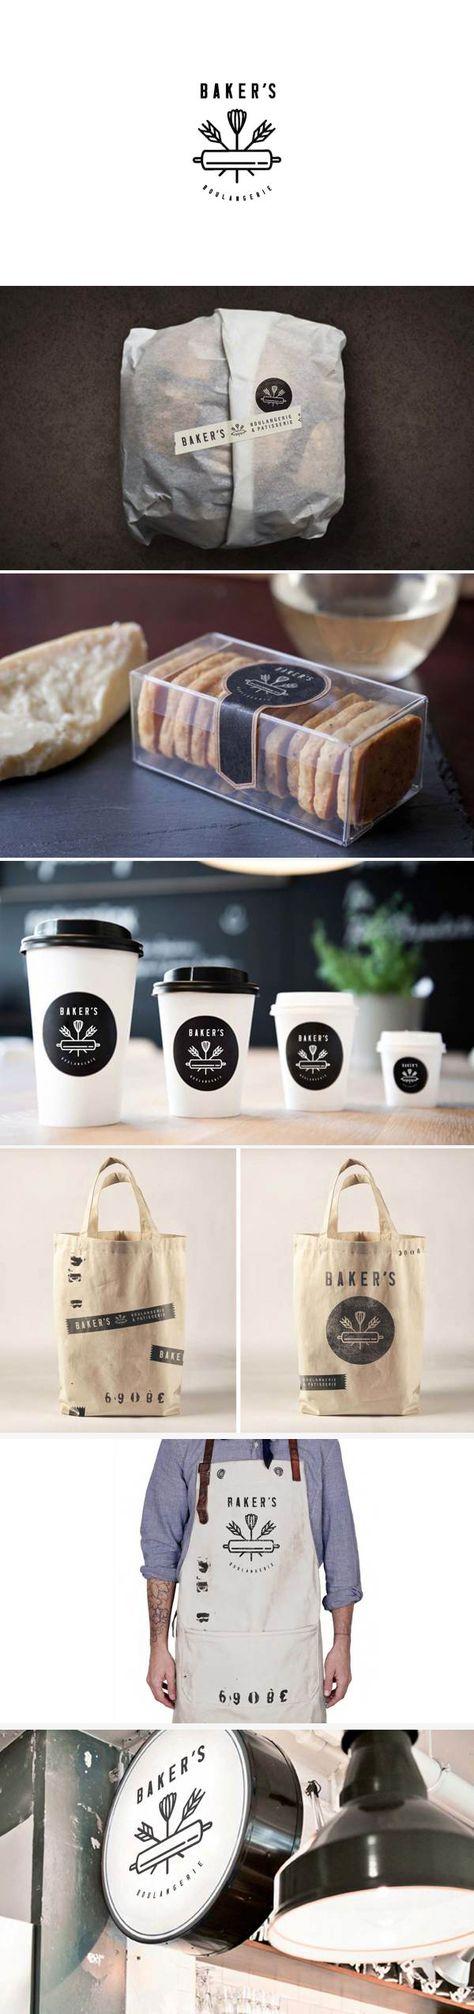 identity / baker's / bakery